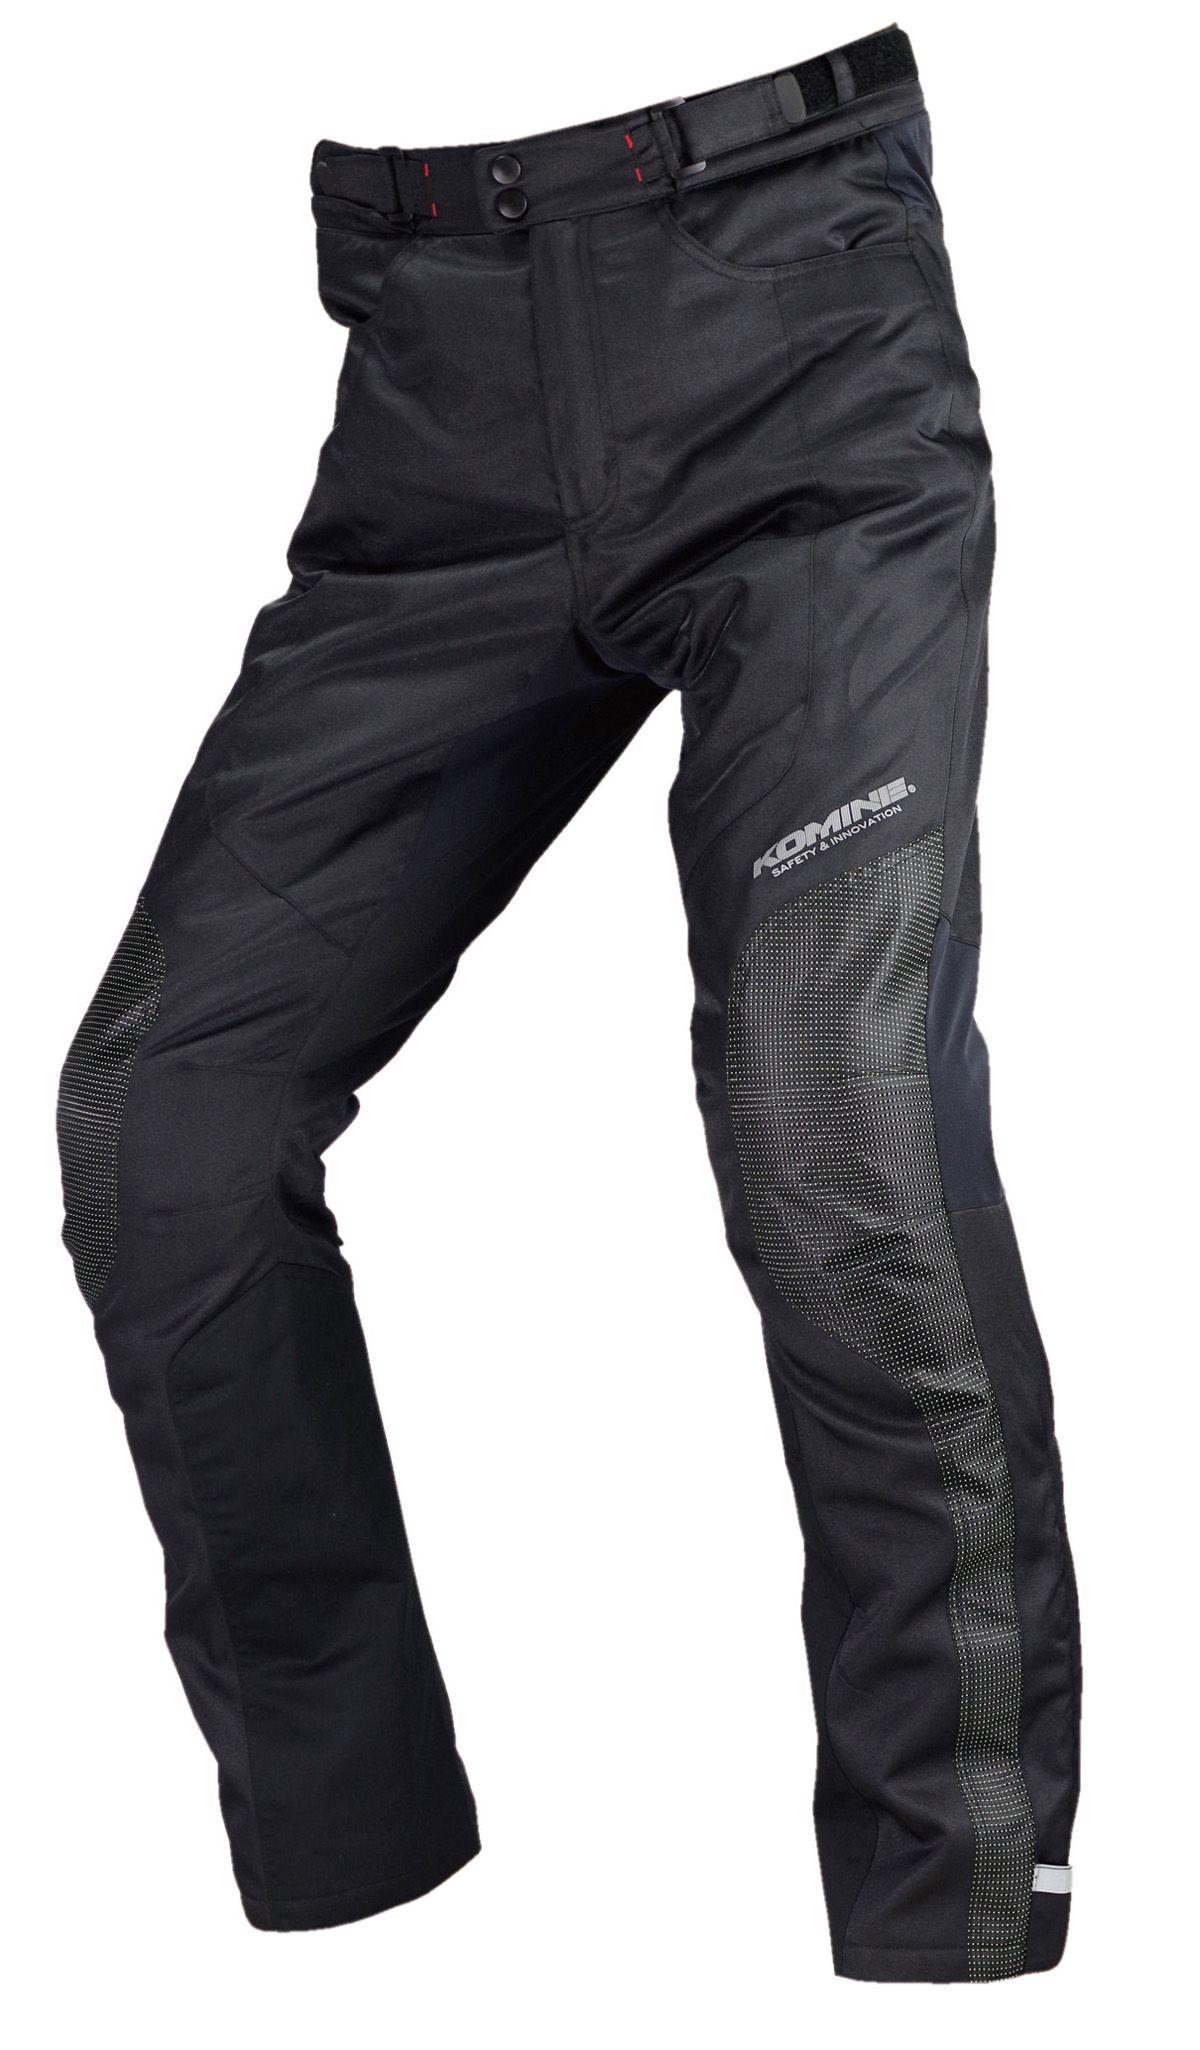 PK-922 Slim Fit Protect Winter Underwear KOMINE